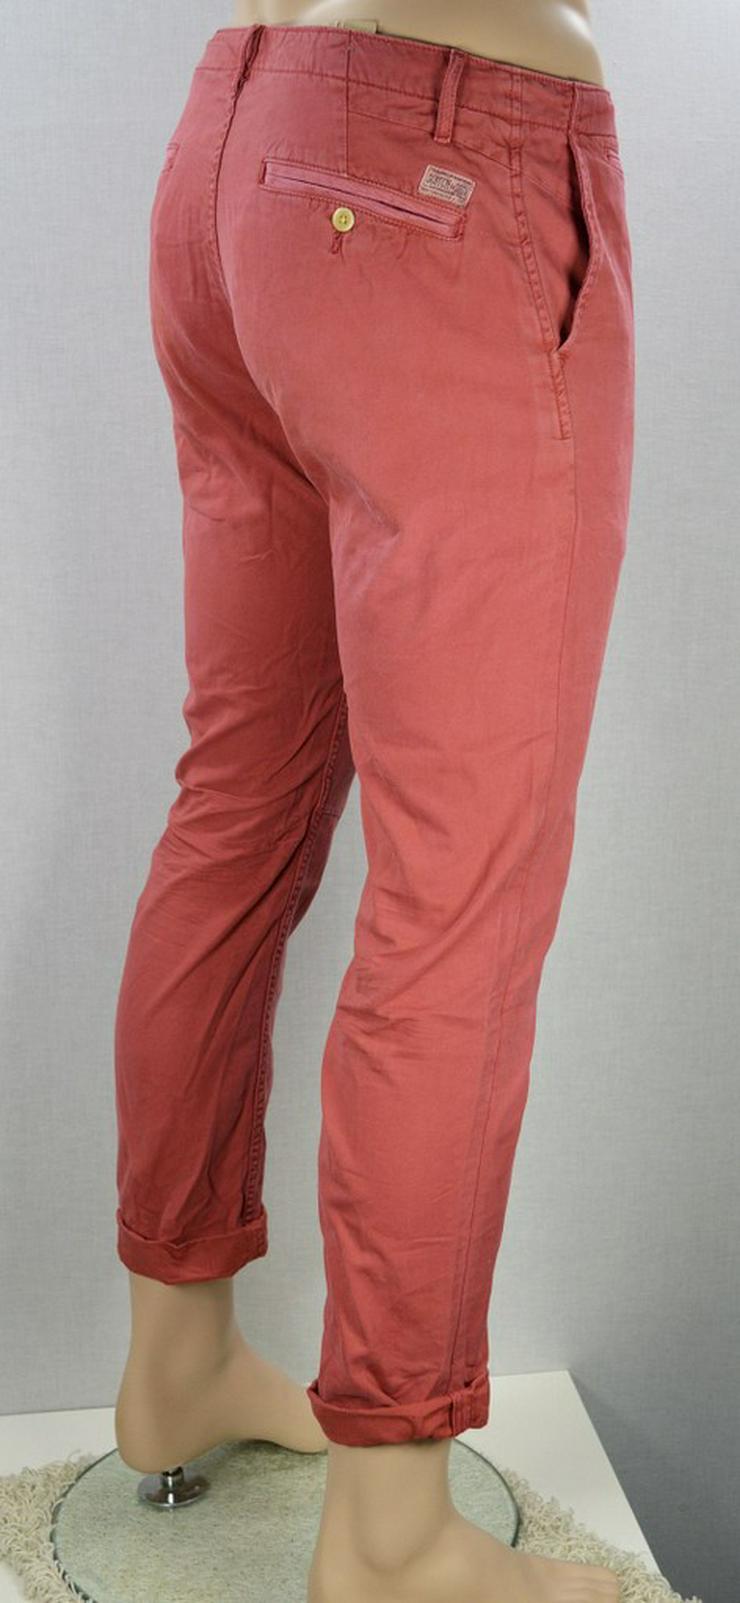 Bild 2: Scotch & Soda Theon Jeans für Abholer 2-015